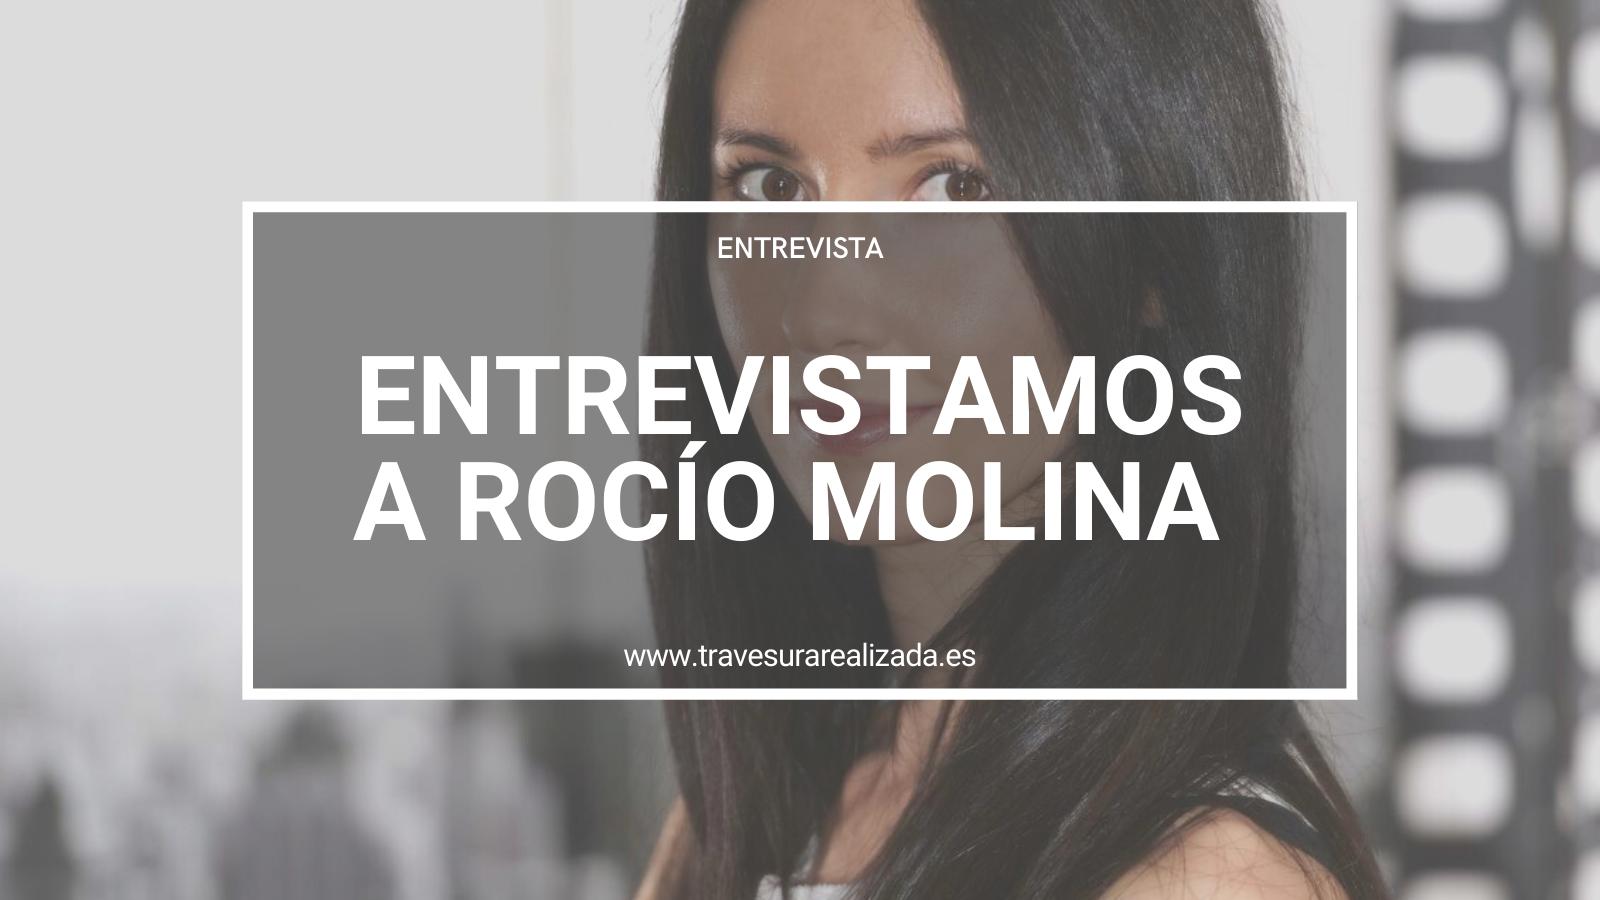 Entrevista a Rocío Molina por 'Imprevistos de viajar en sofá'